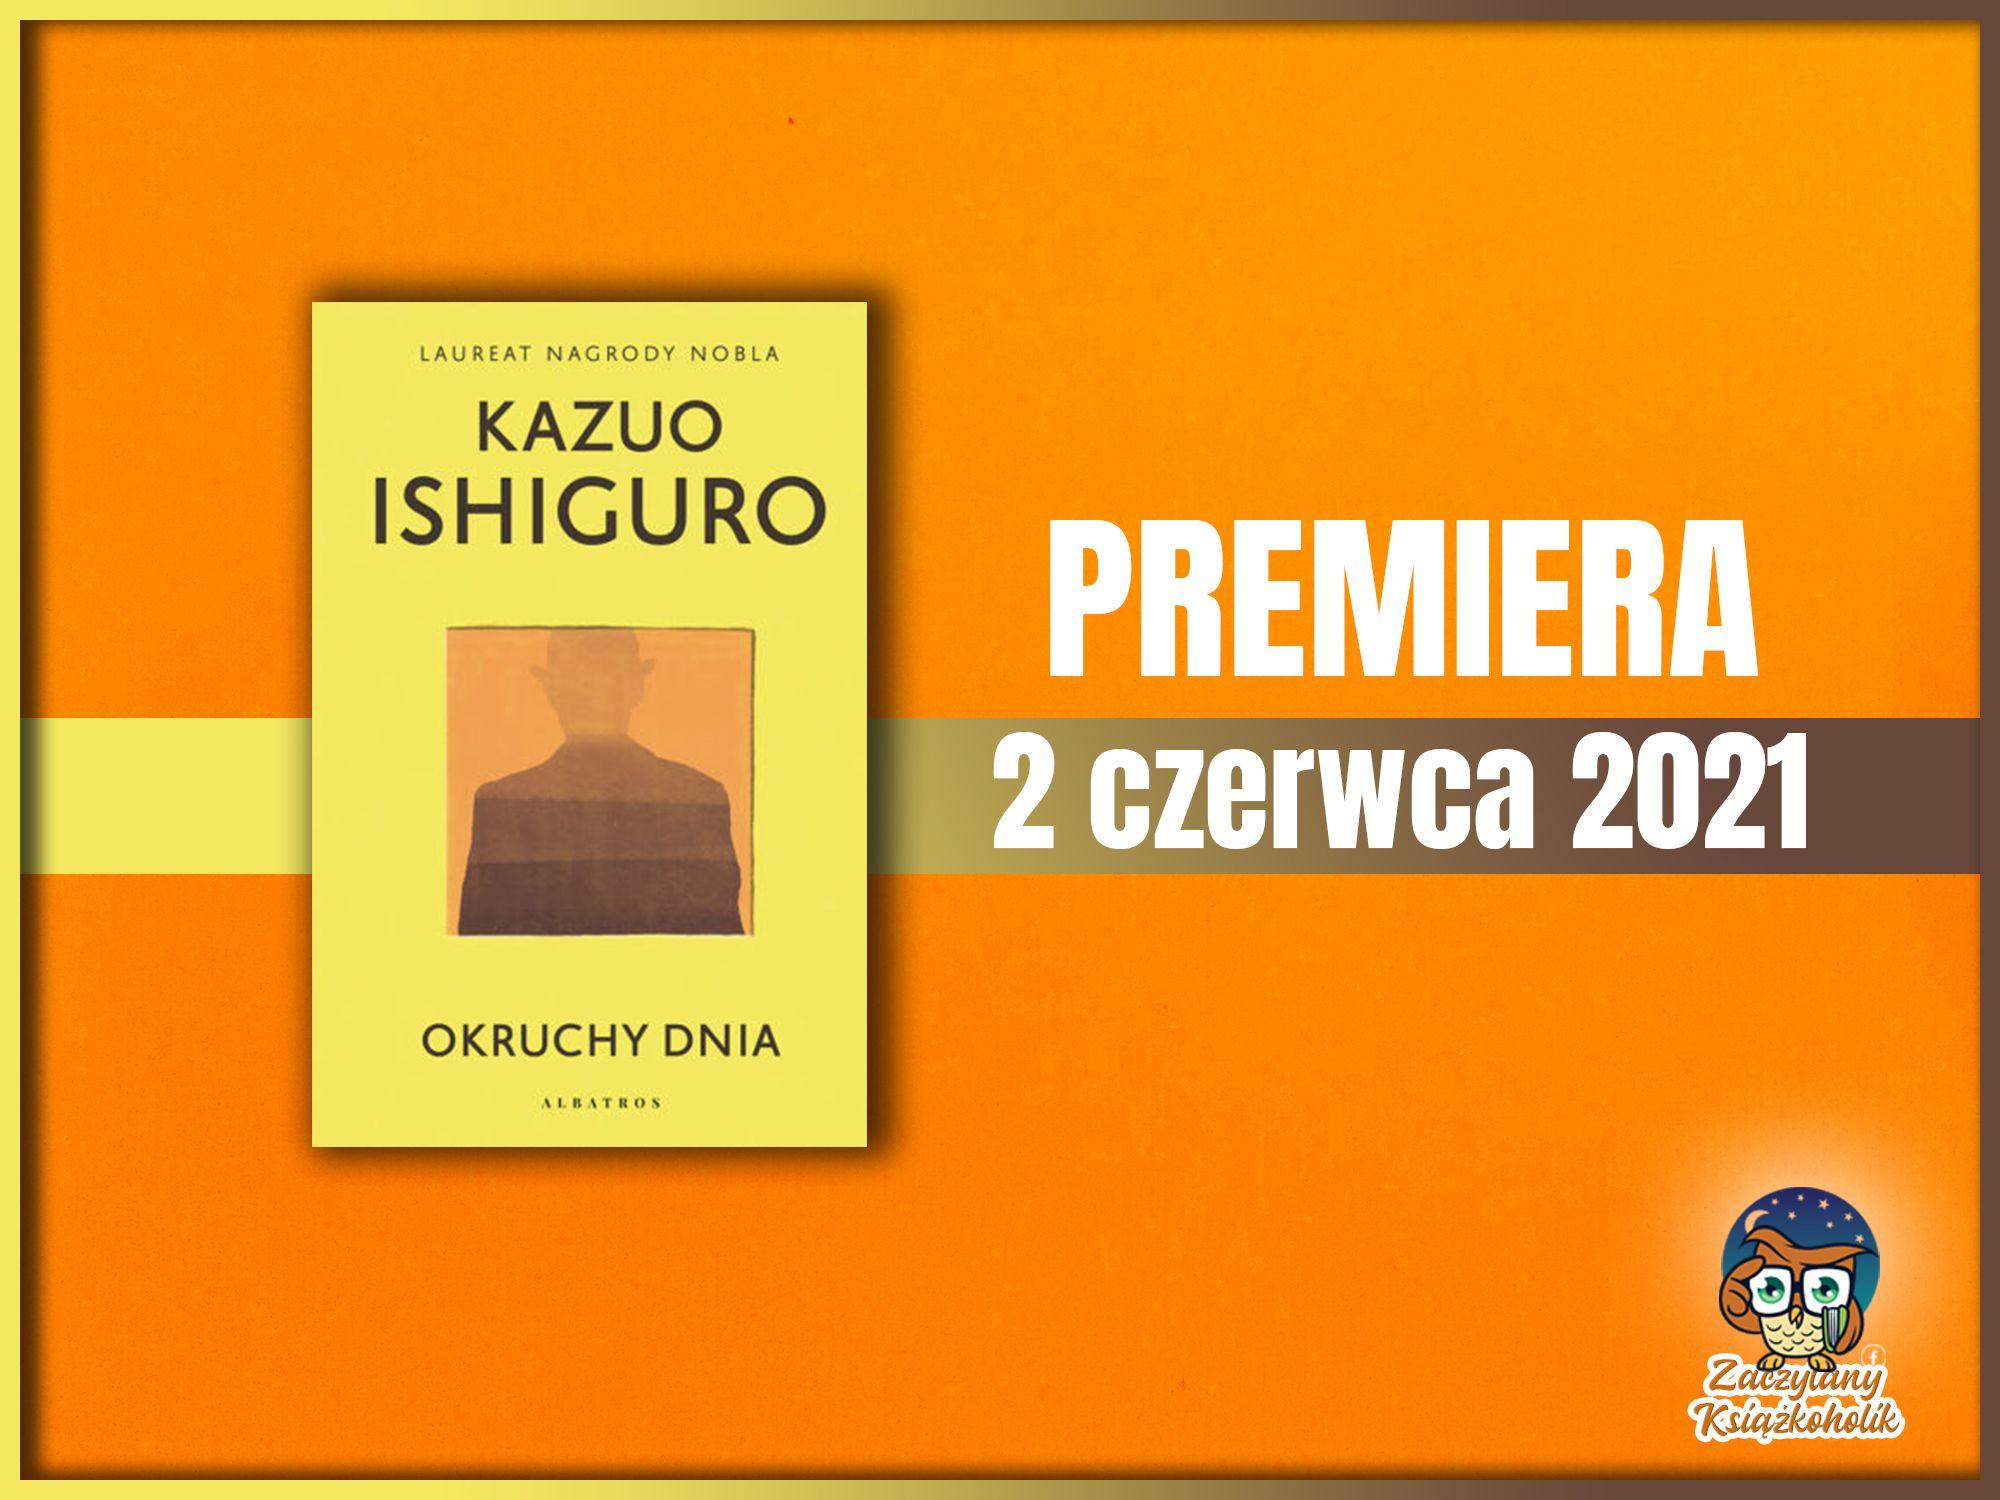 Okruchy dnia, Kazuo Ishiguro, zaczytanyksiazkoholik.pl